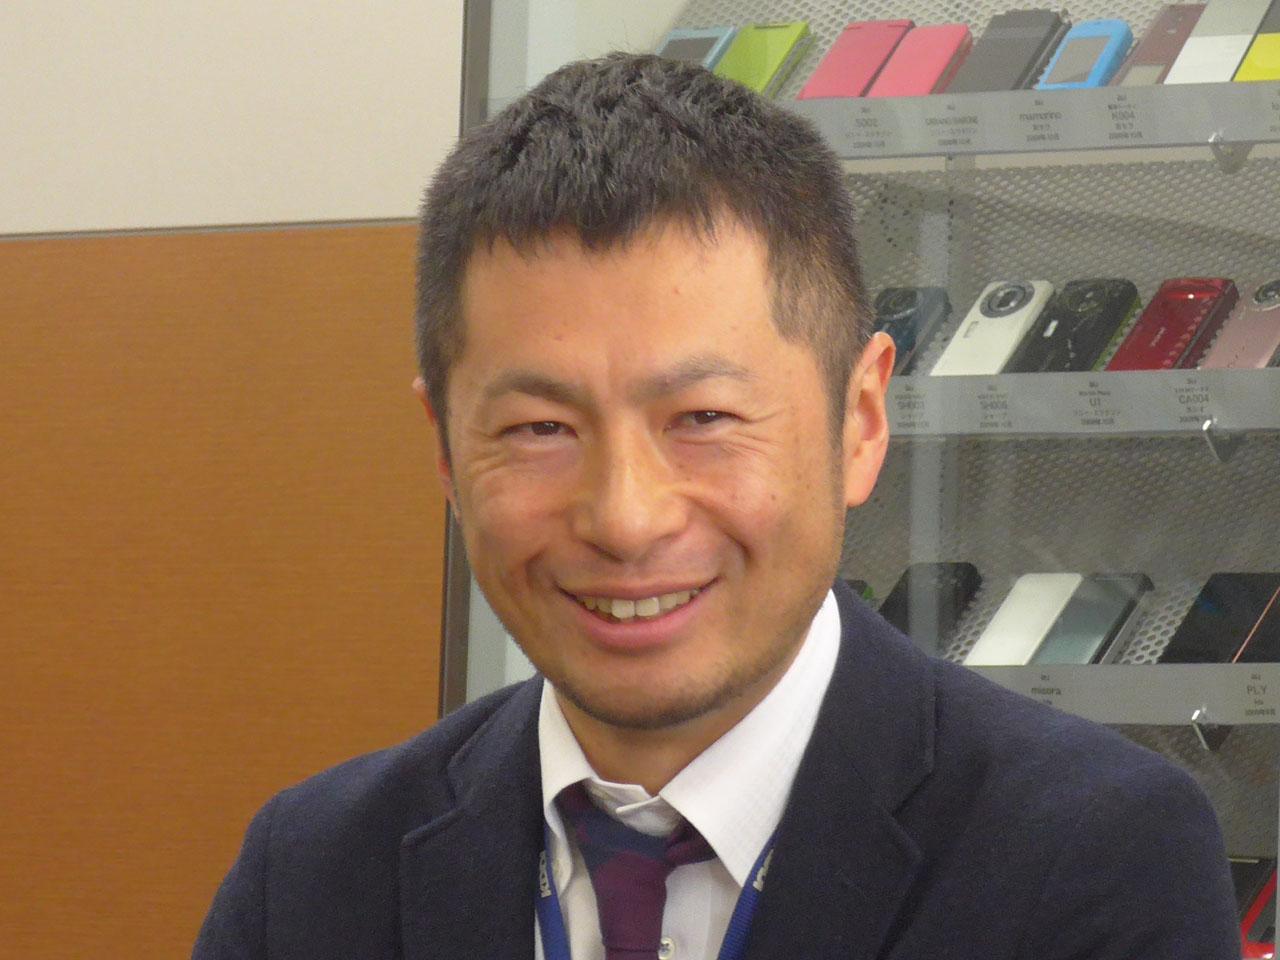 KDDI株式会社ネットワーク技術本部ネットワークマネジメント部ネットワーク計画1グループ課長補佐の川島倫央氏